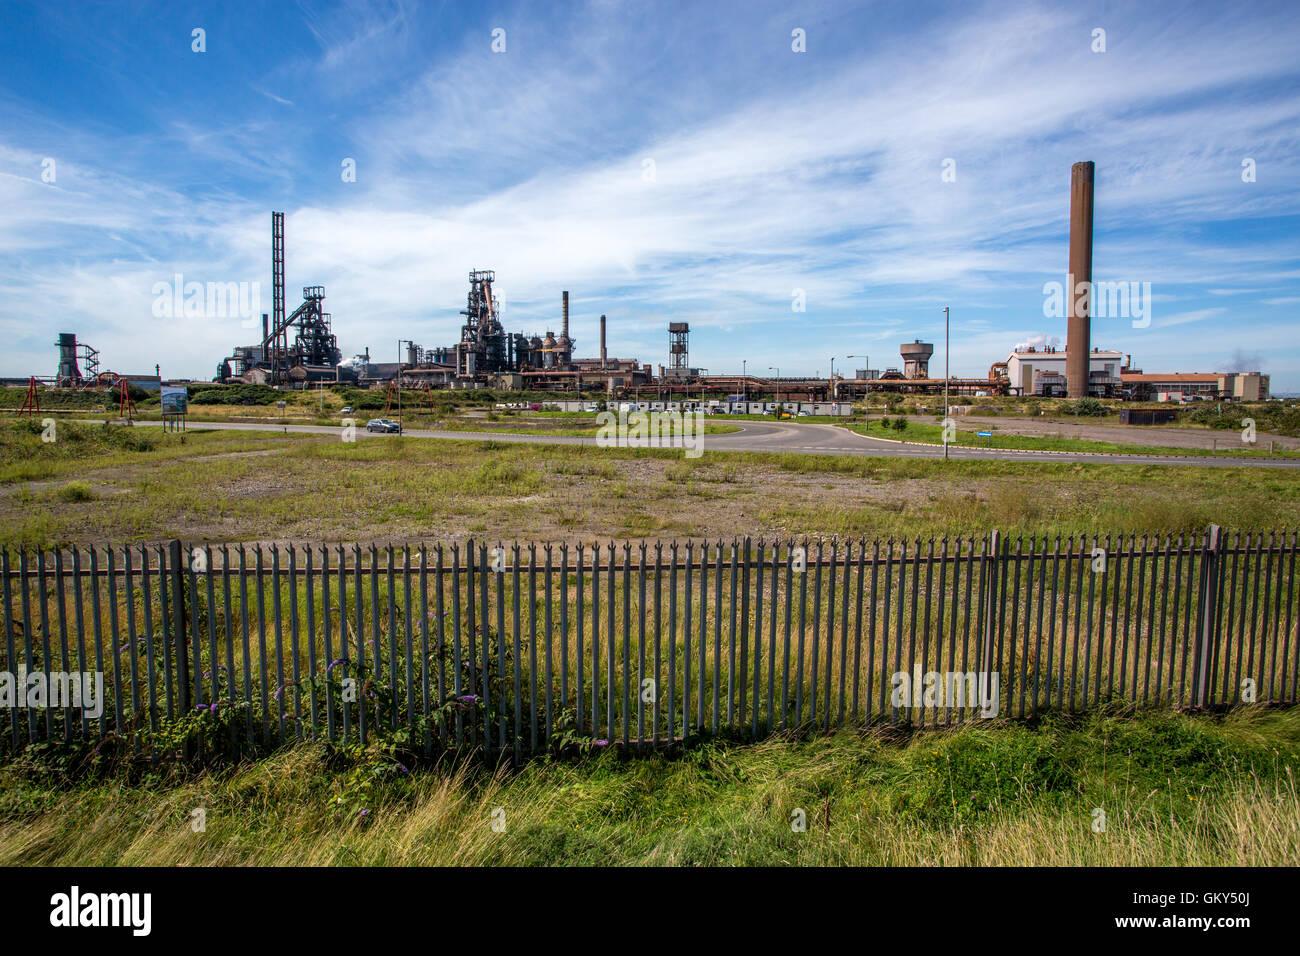 Port talbot, Port talbot steel works, steelworks, porttalbot, wales, uk, steel, works, industry, strike, job, jobs, Stock Photo